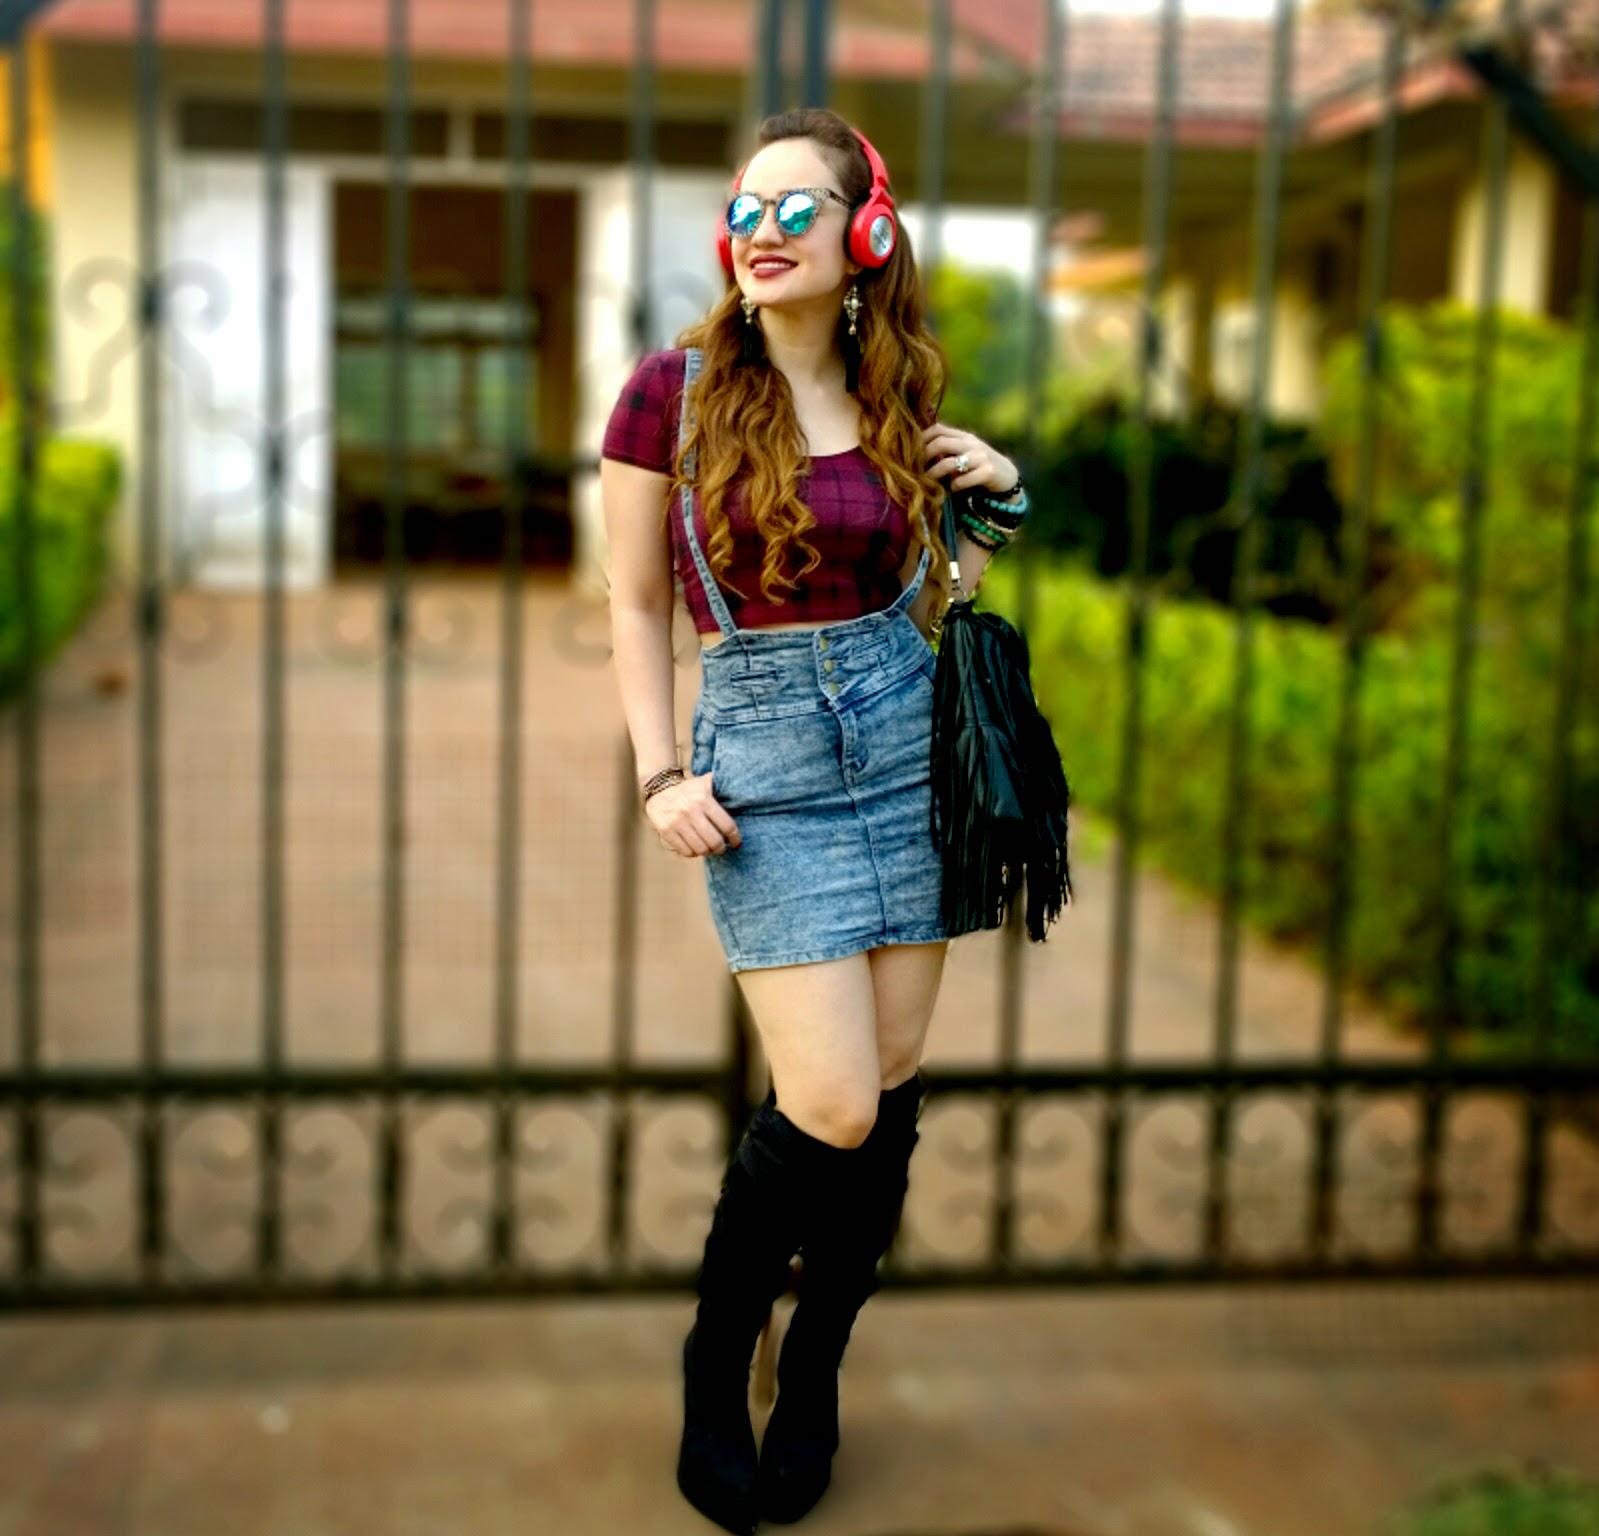 Tartan Plaid Crop Top,Denim Suspender Skirt,Ankle boots,JBL Wireless Headphones